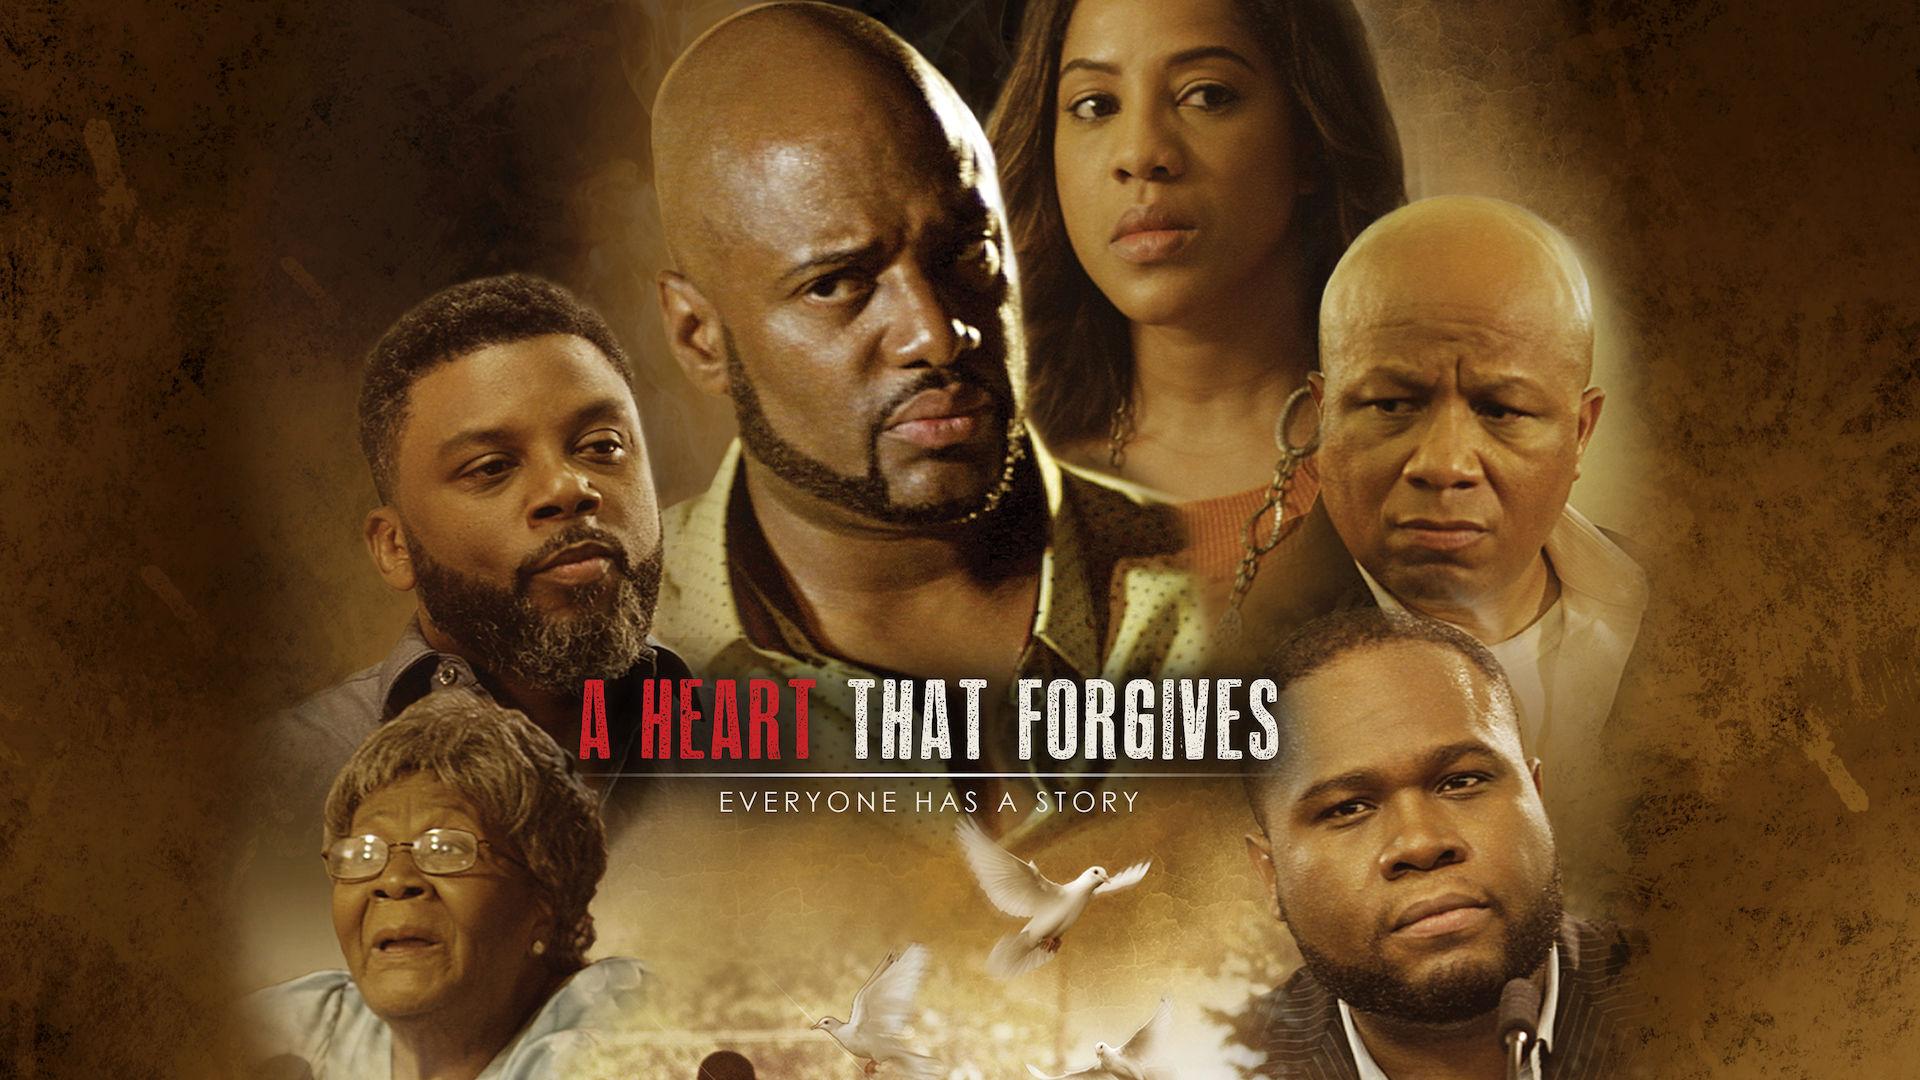 Heart That Forgives